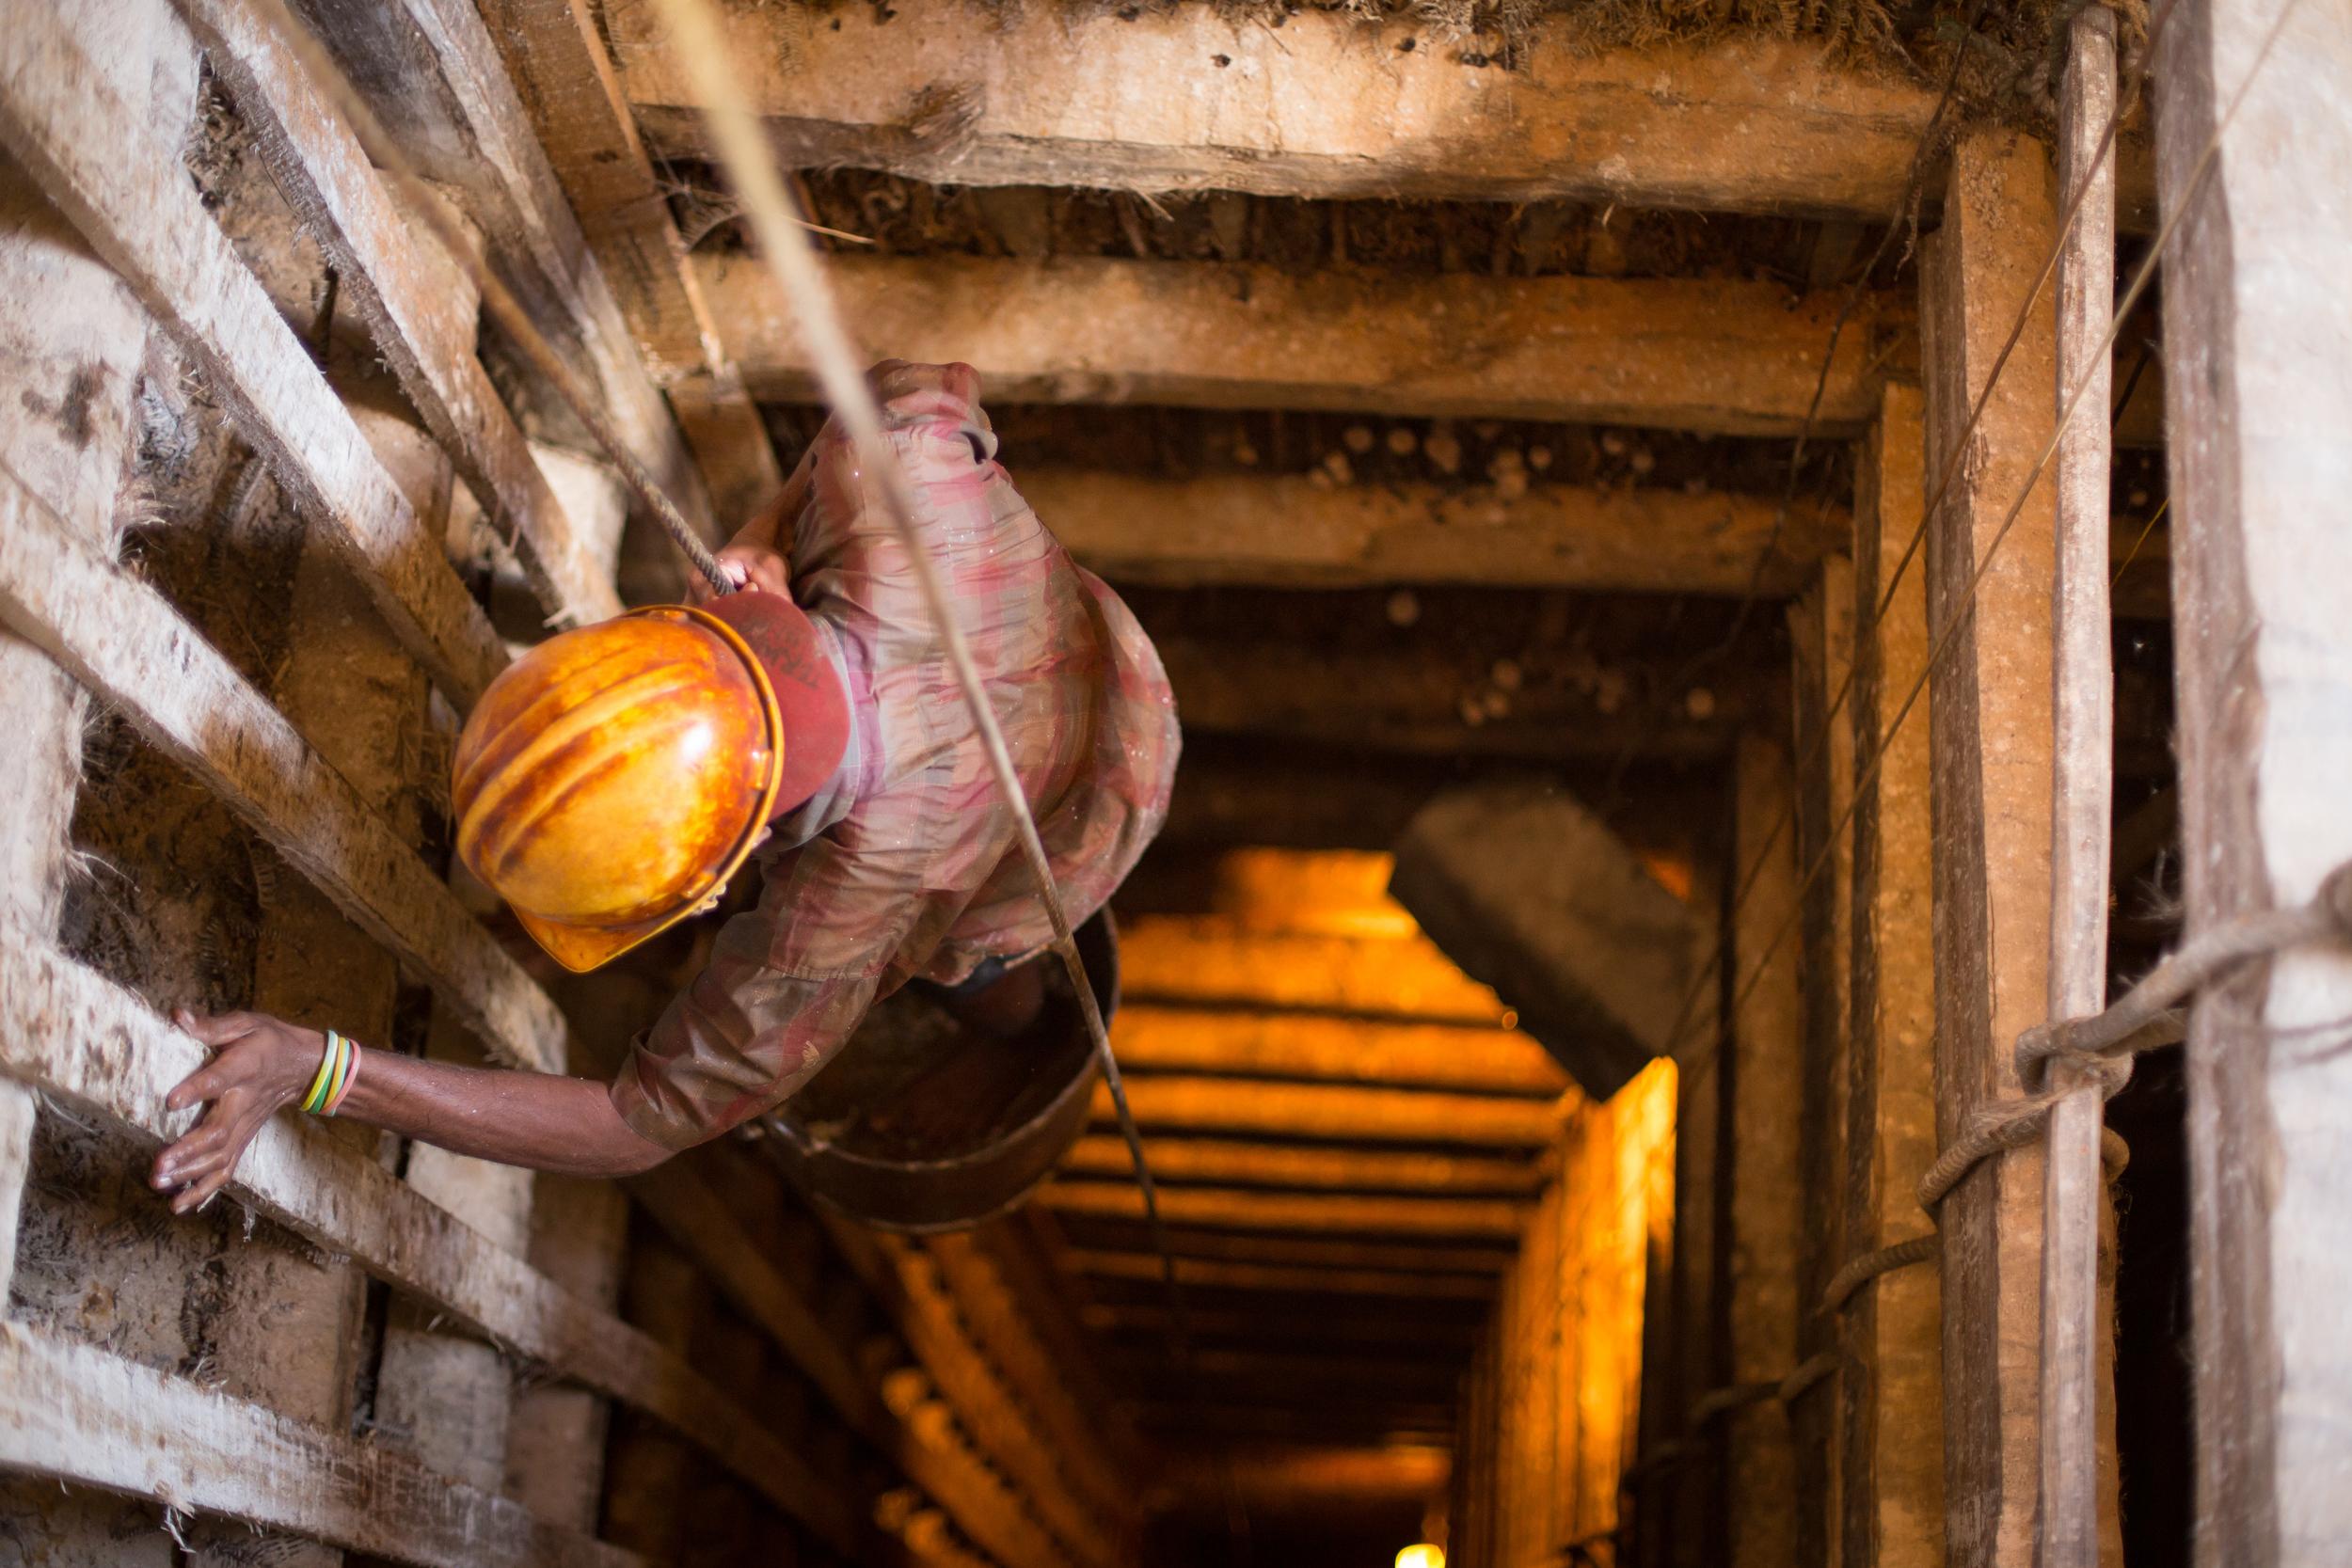 Descending into a moonstone mine -Meetiyagoda,Sri Lanka